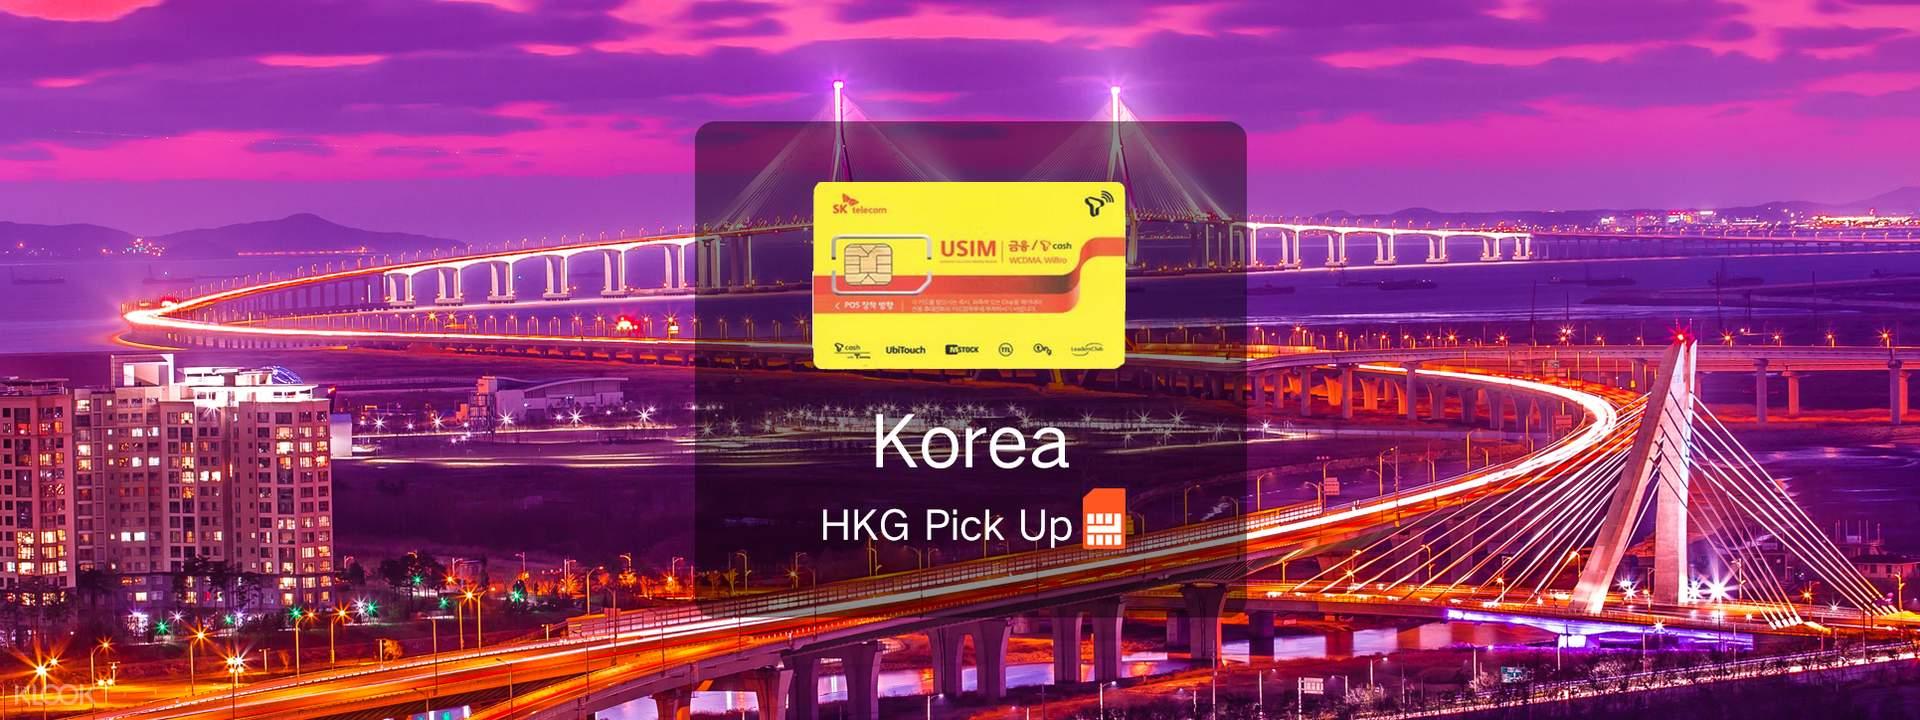 3G/4G SIM Card (HKG Pick Up) for South Korea - Klook